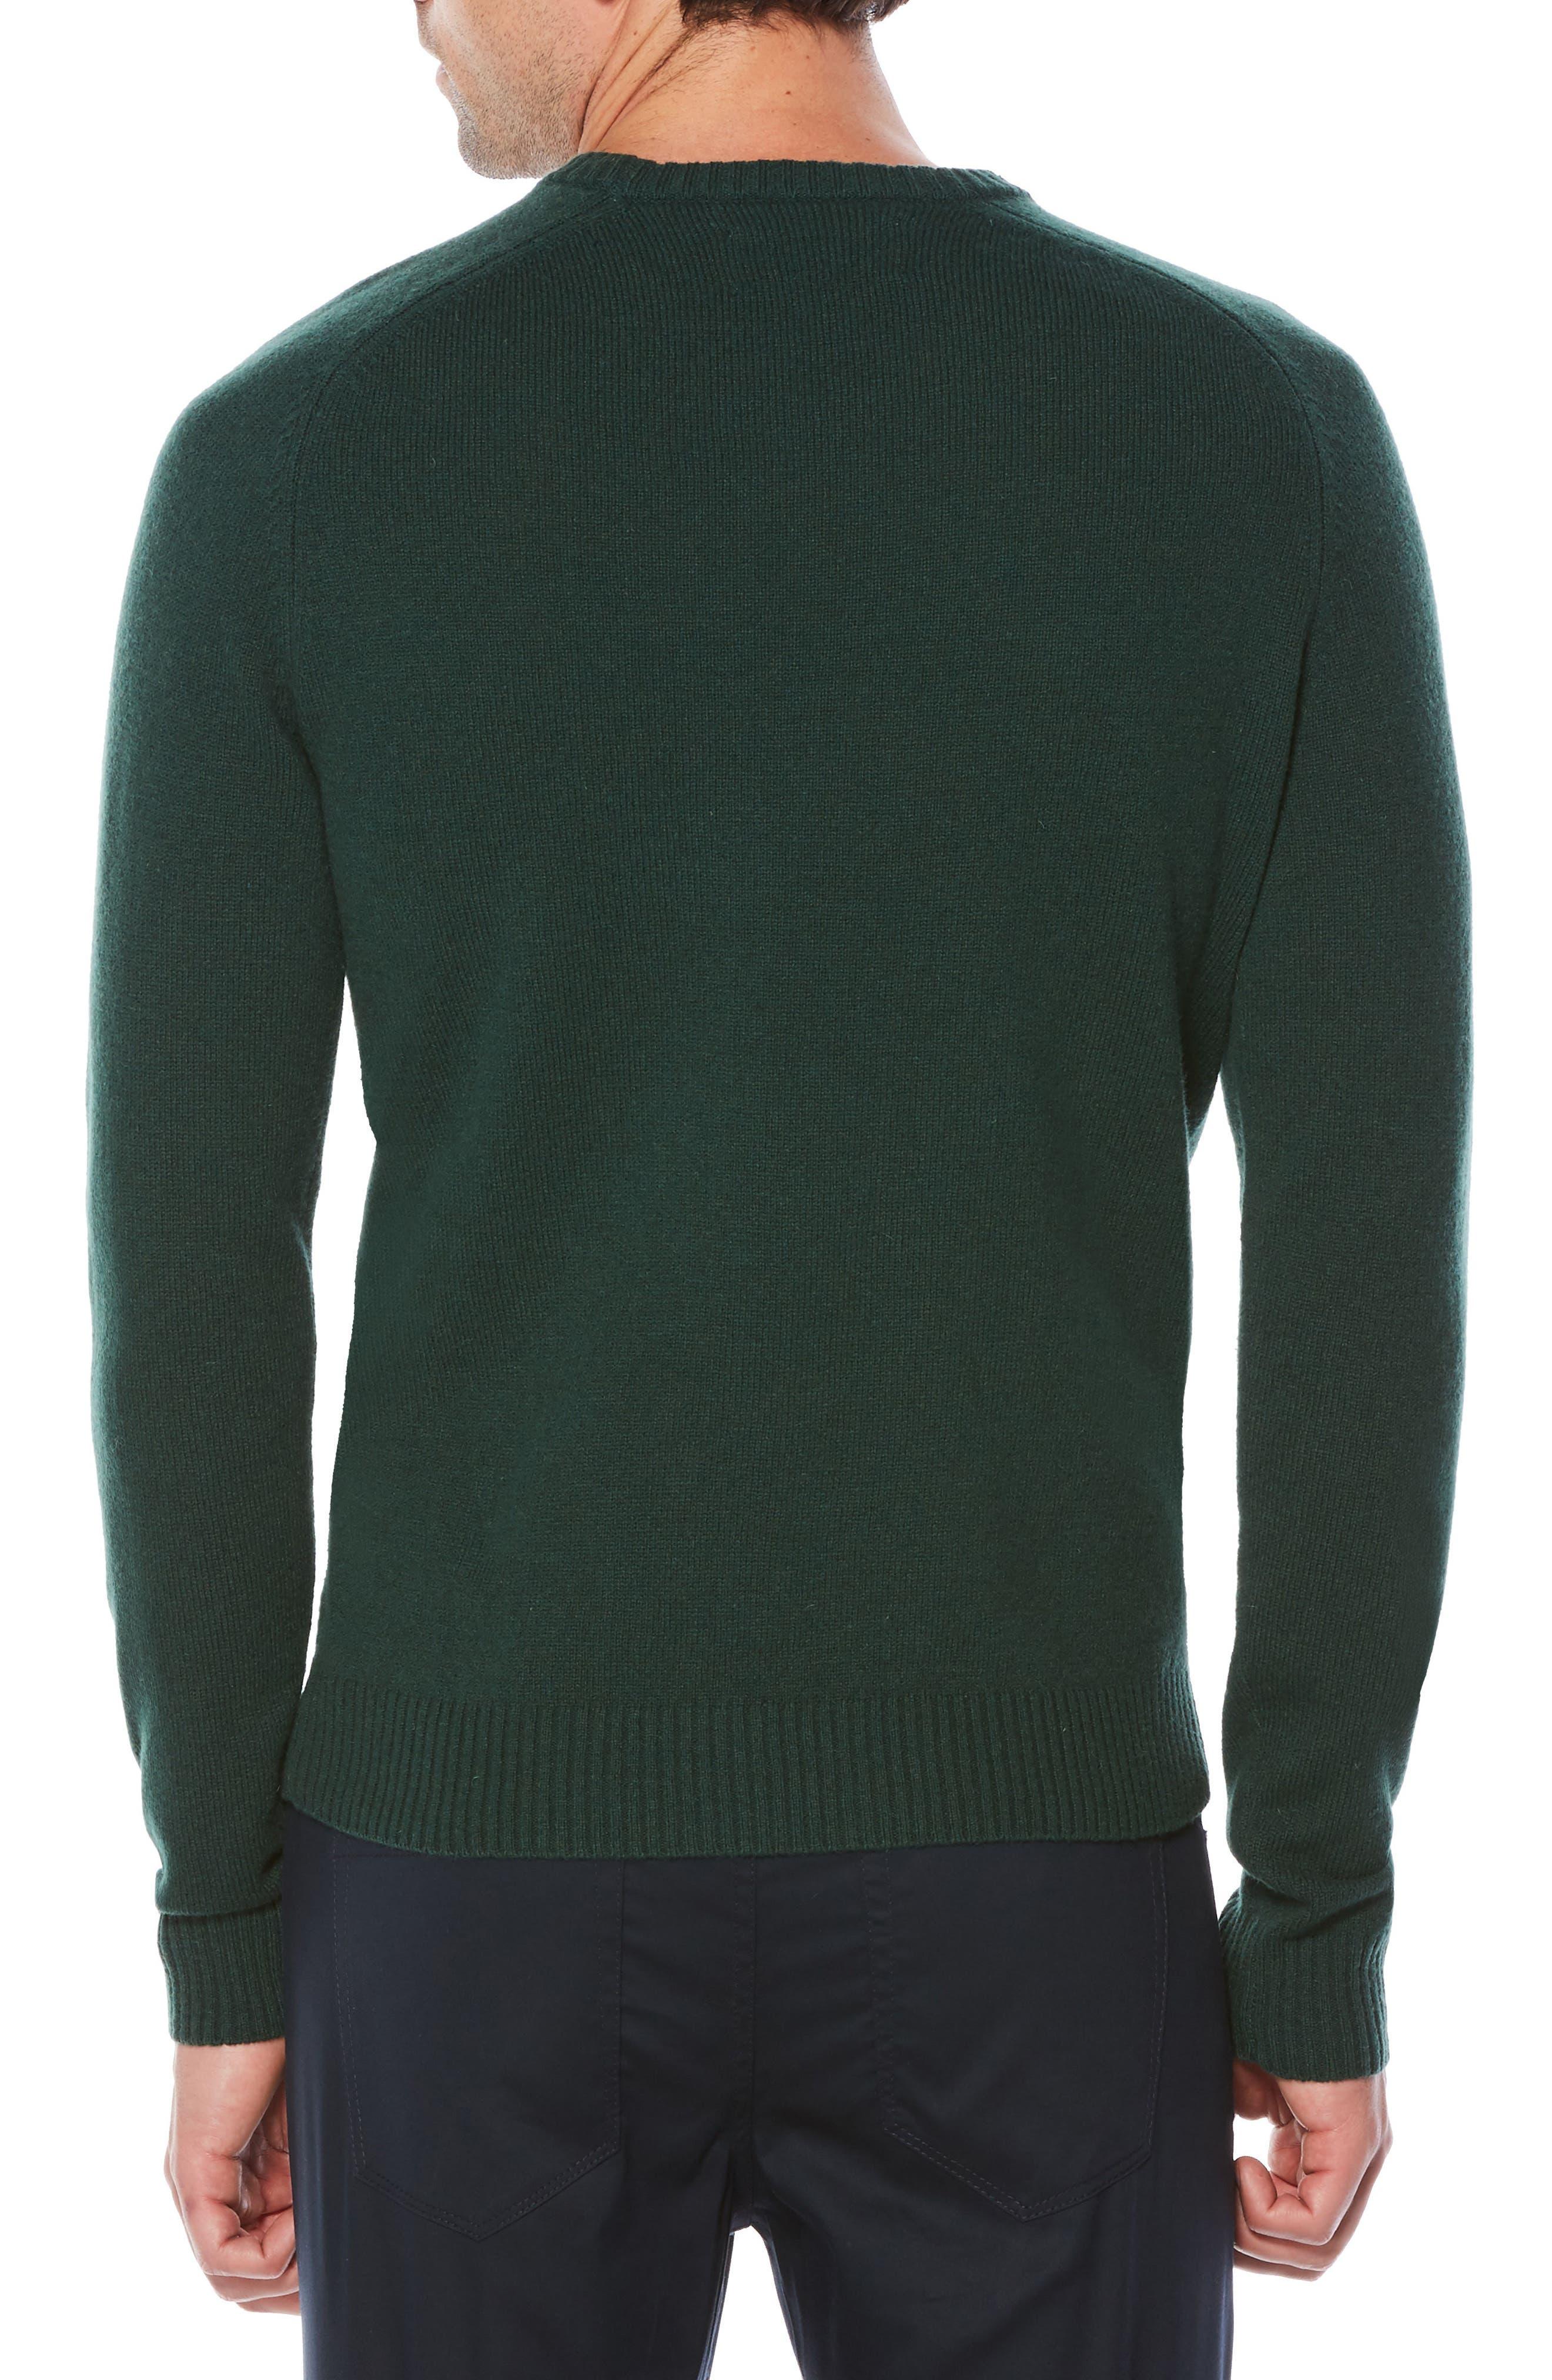 P55 Lambswool Sweater,                             Alternate thumbnail 6, color,